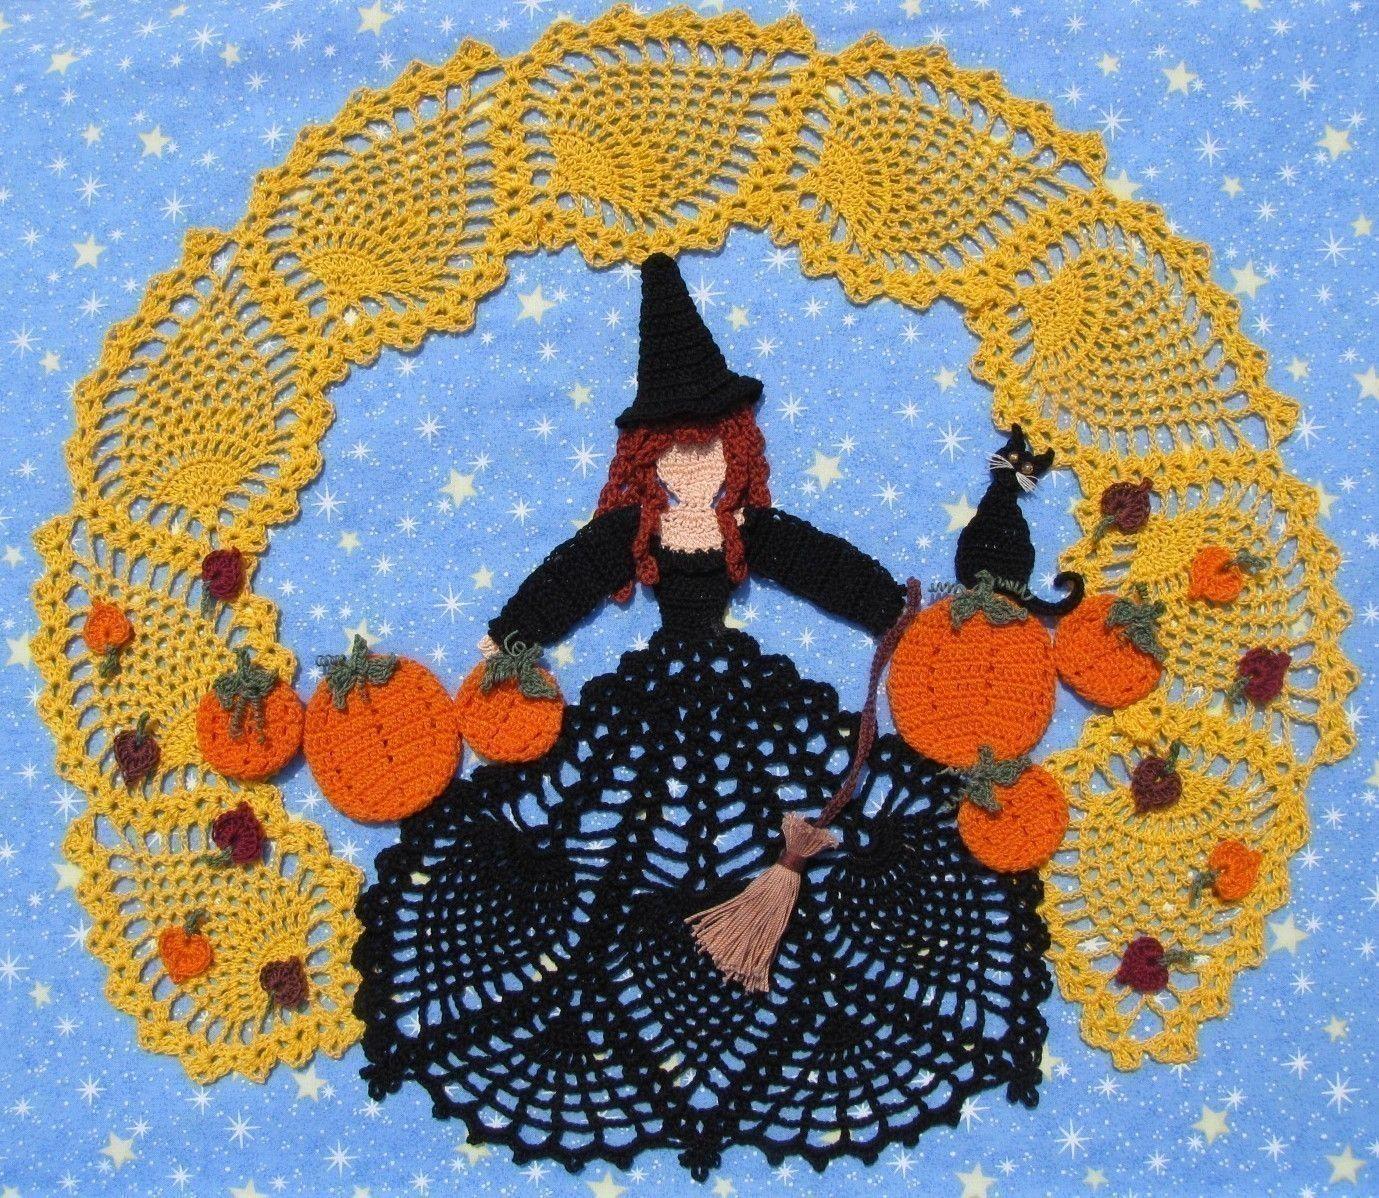 Crochet halloween doilies crochet pattern free crochet crochet halloween doilies crochet pattern free crochet doilies patterns doily patterns bankloansurffo Image collections